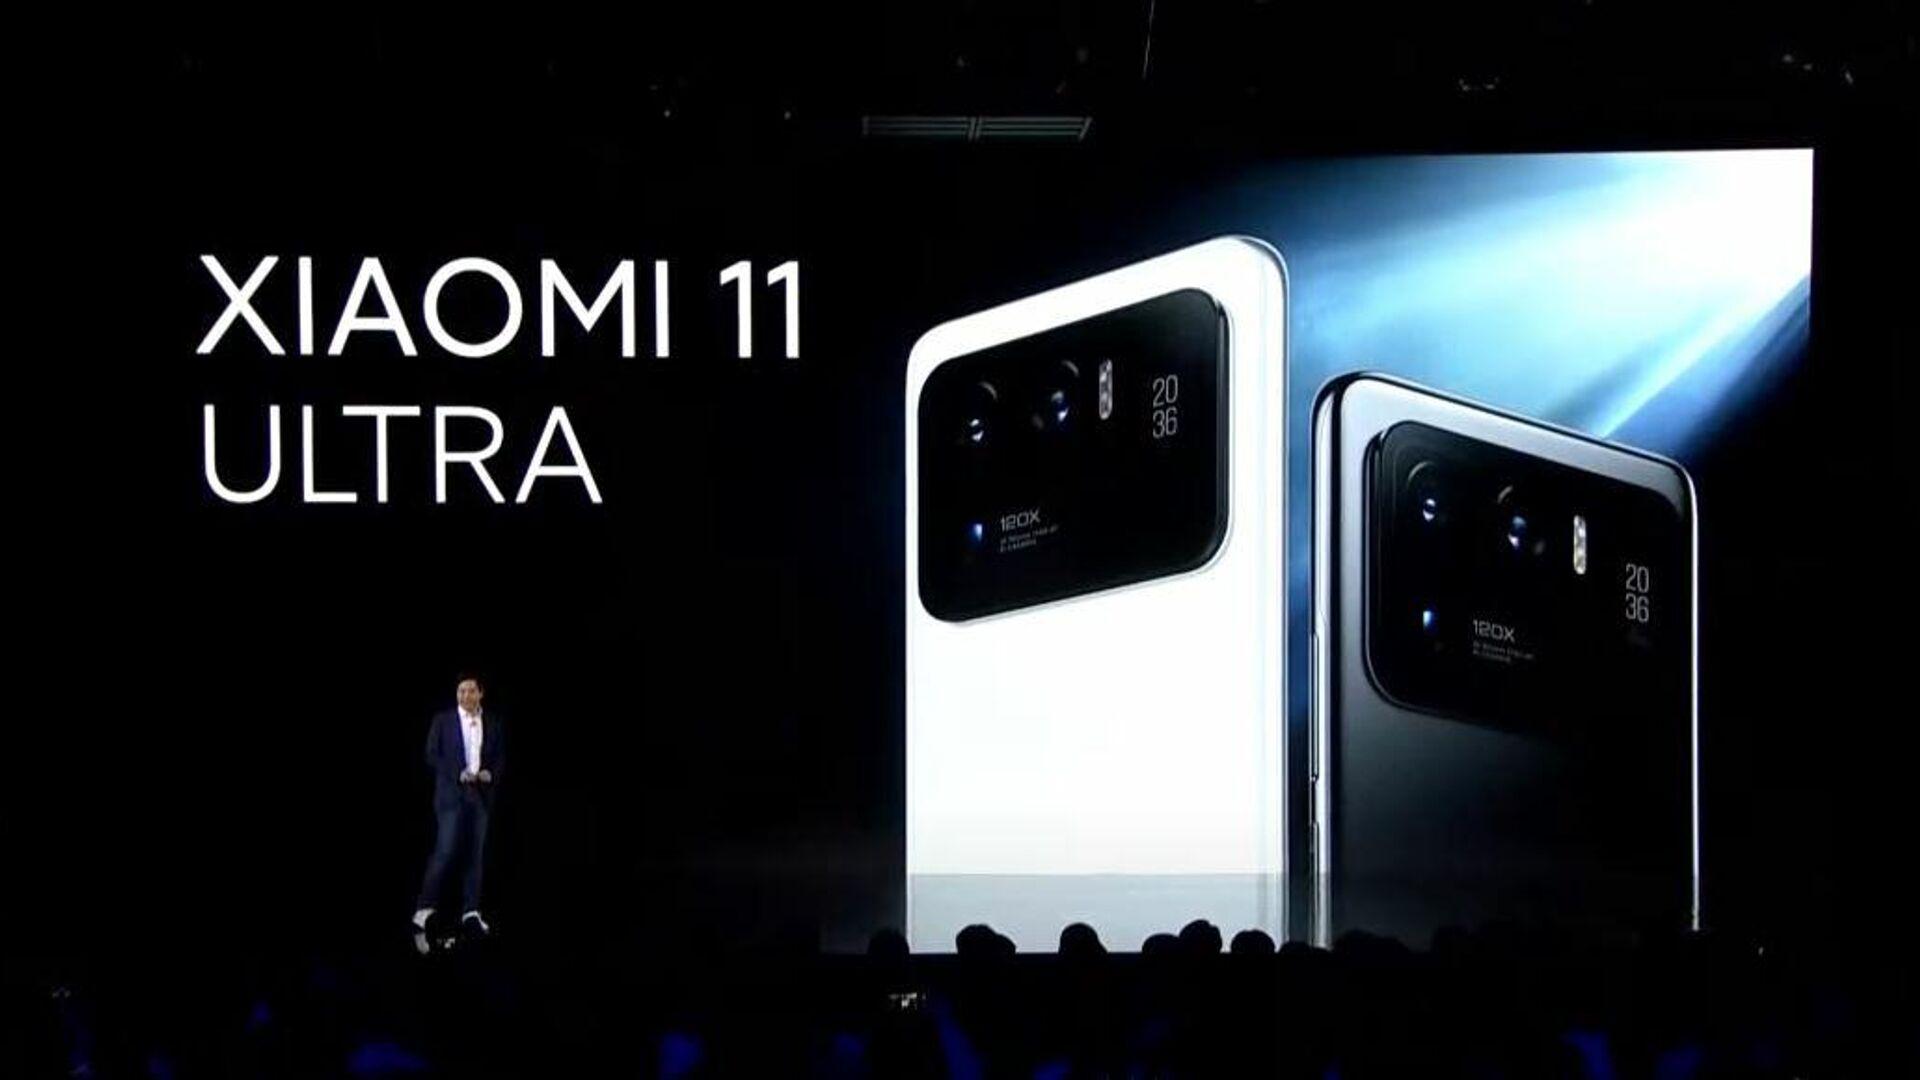 В смартфоне Xiaomi Mi 11 найден критический дефект